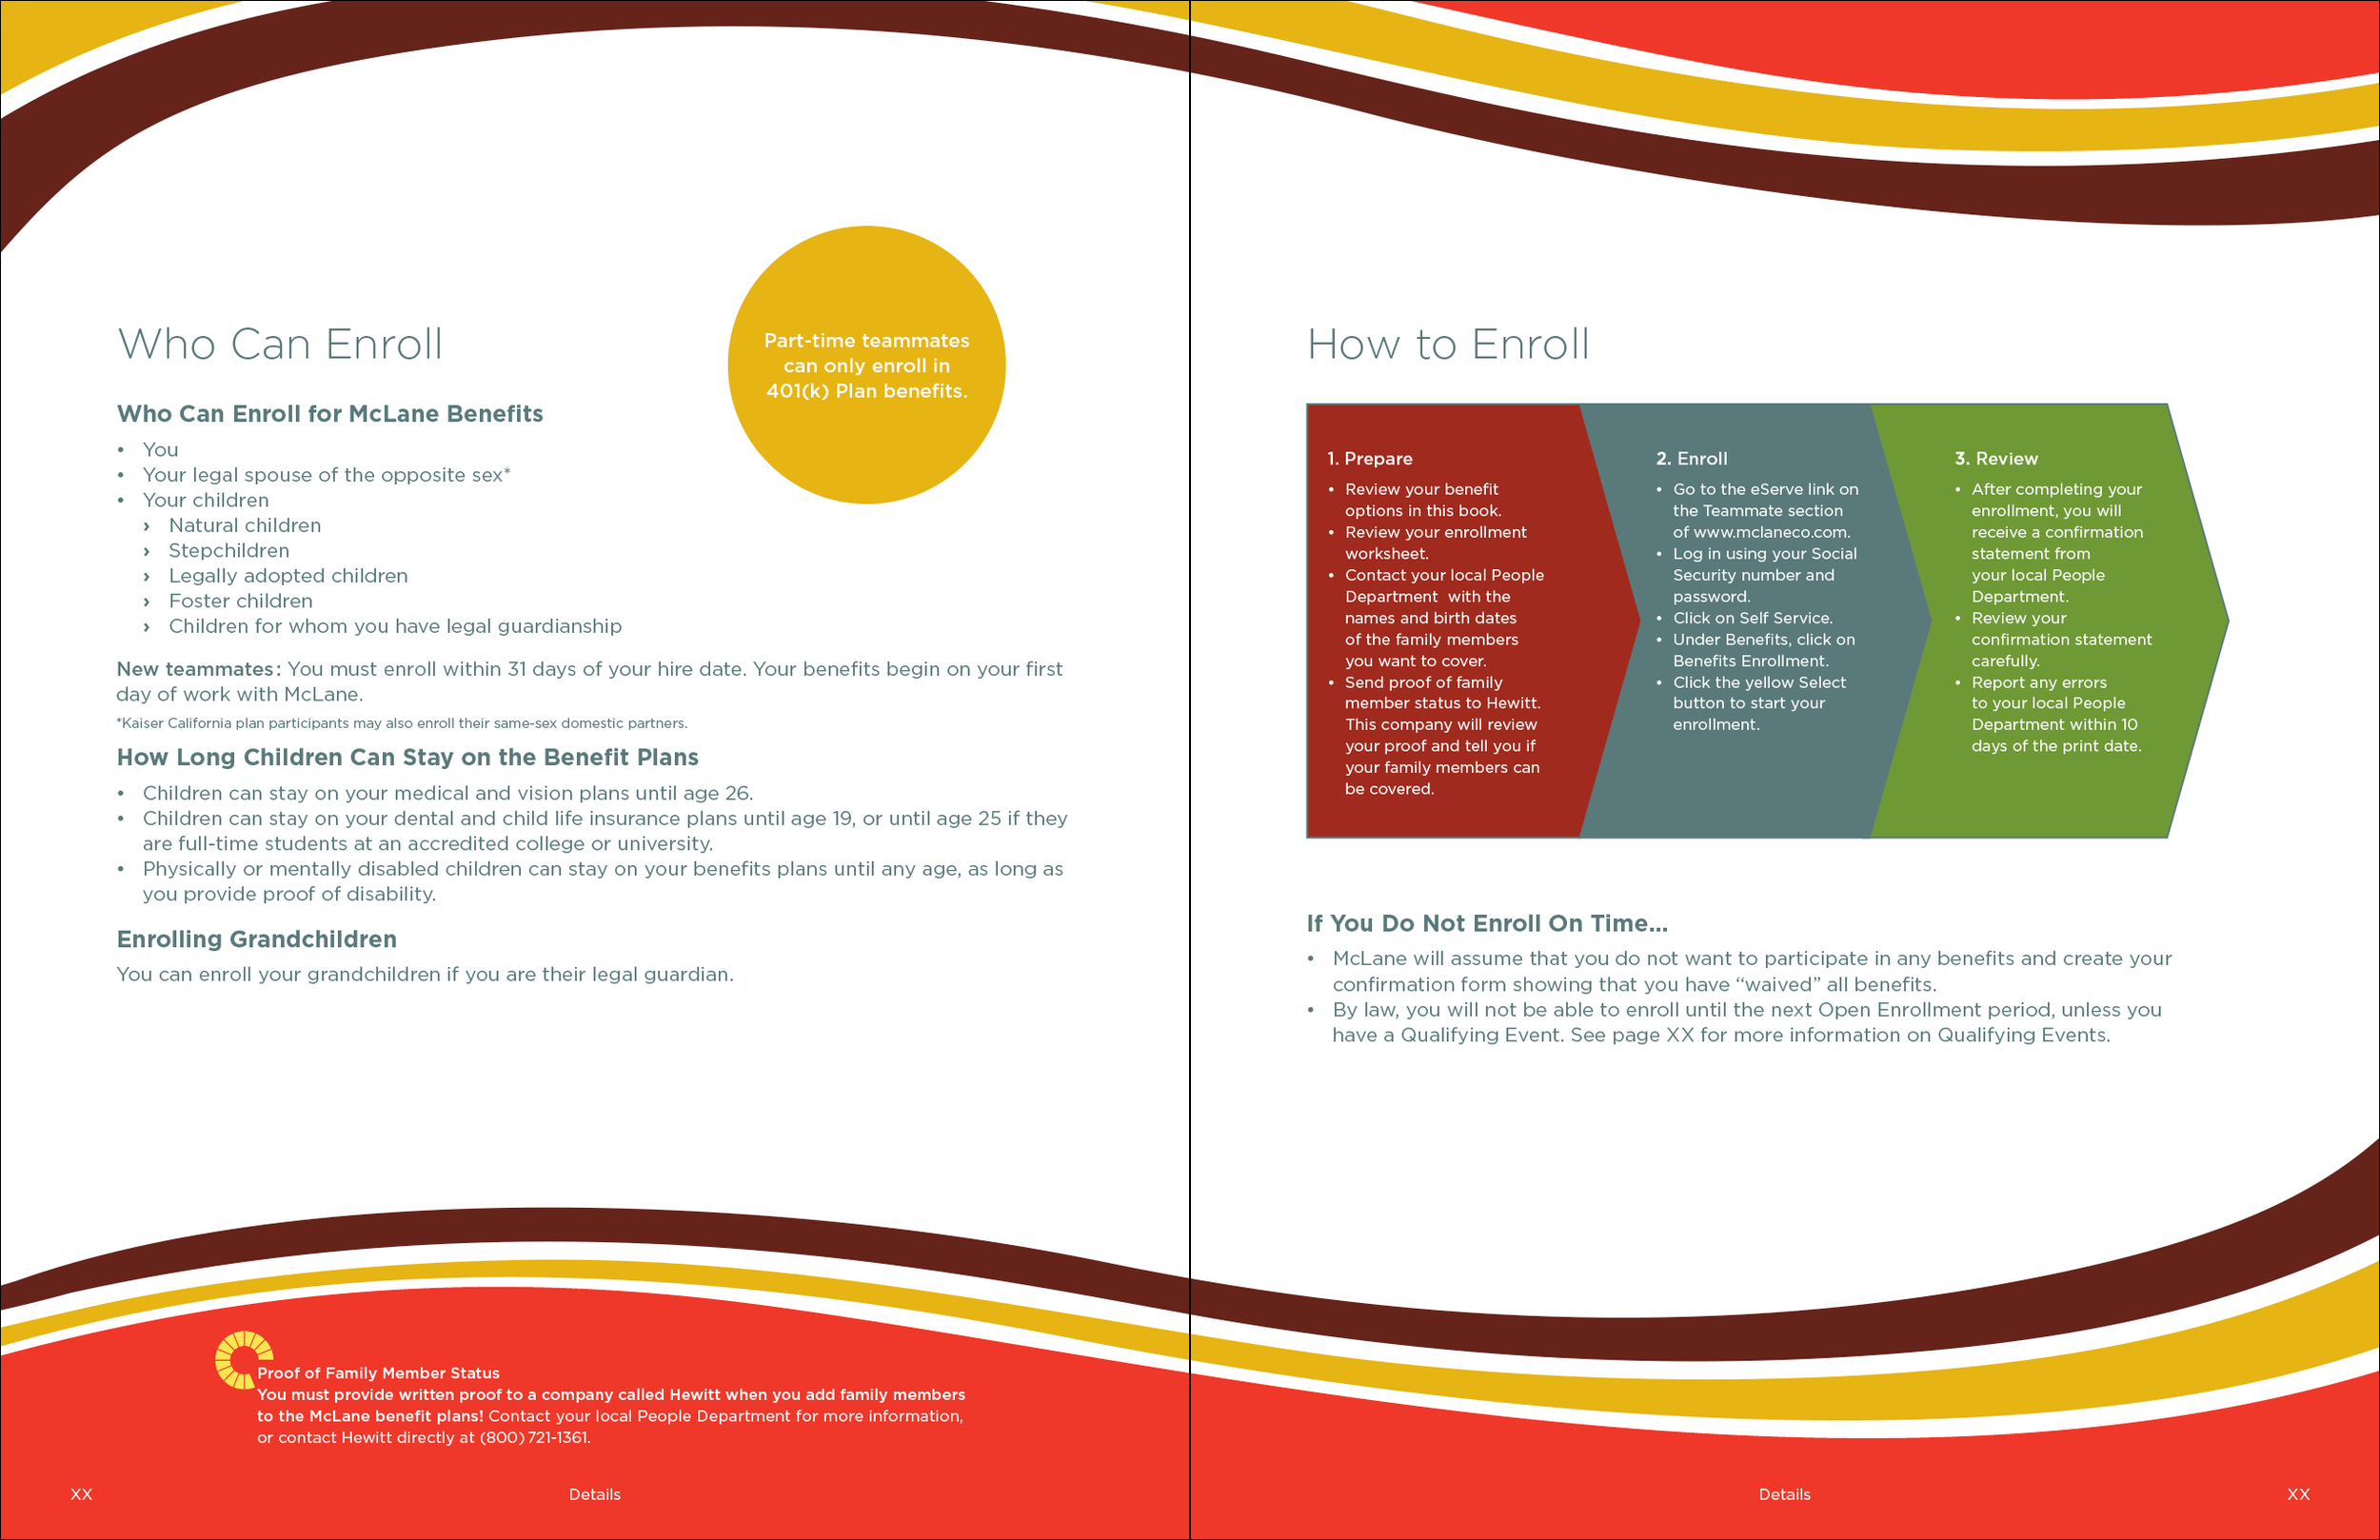 MLMCBRC15596__Benefits_Enroll_guide_single_pages_0415.jpg